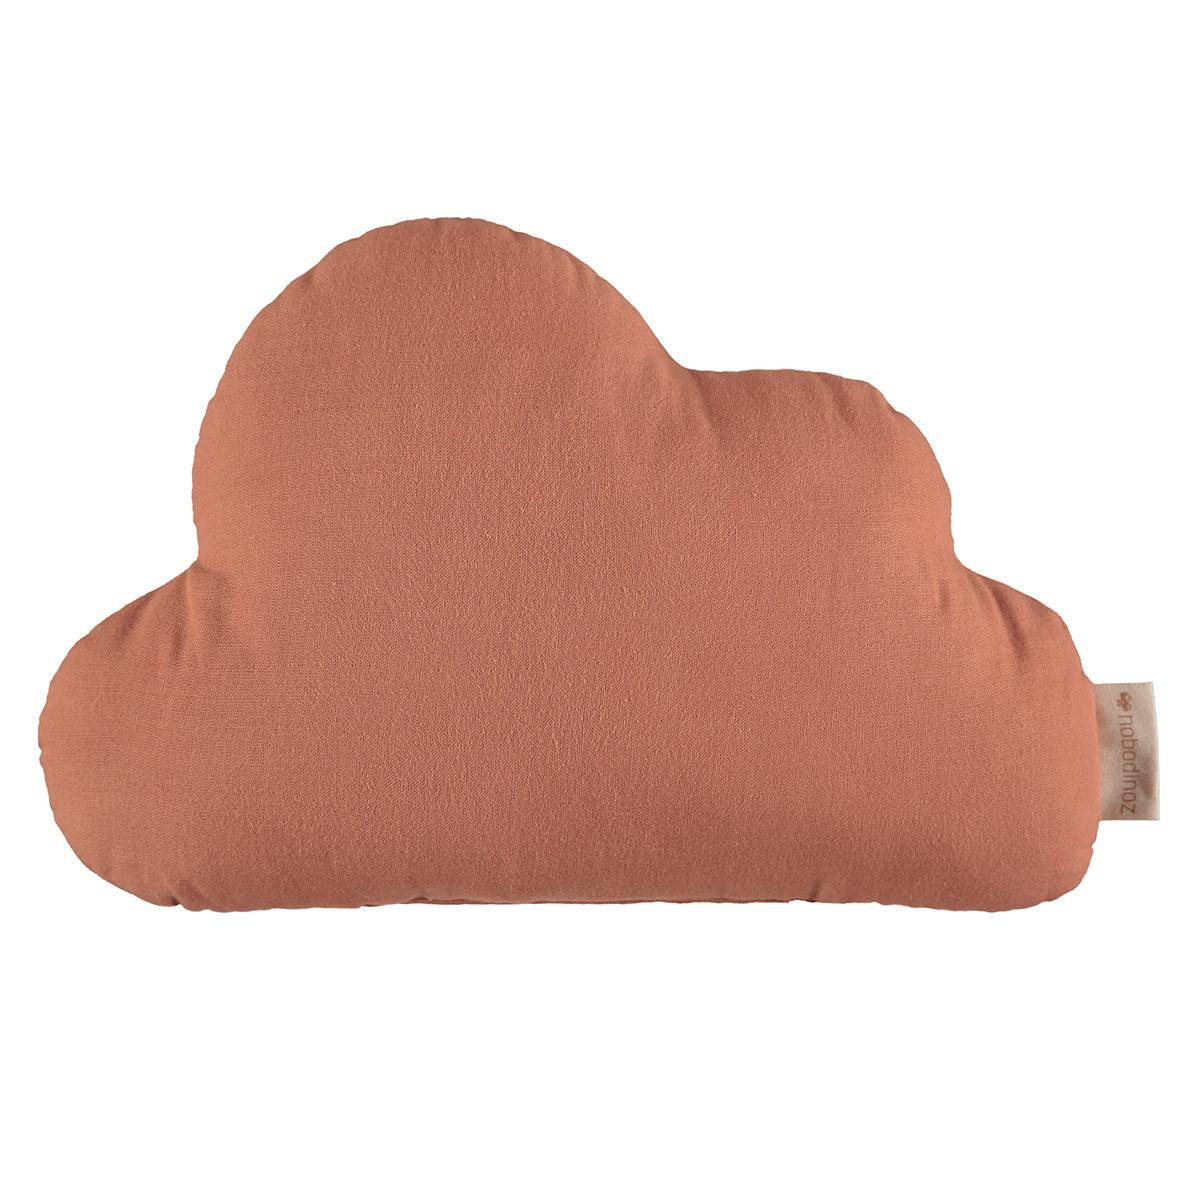 Coussin Coussin Cloud - Toffee Coussin Cloud - Toffee